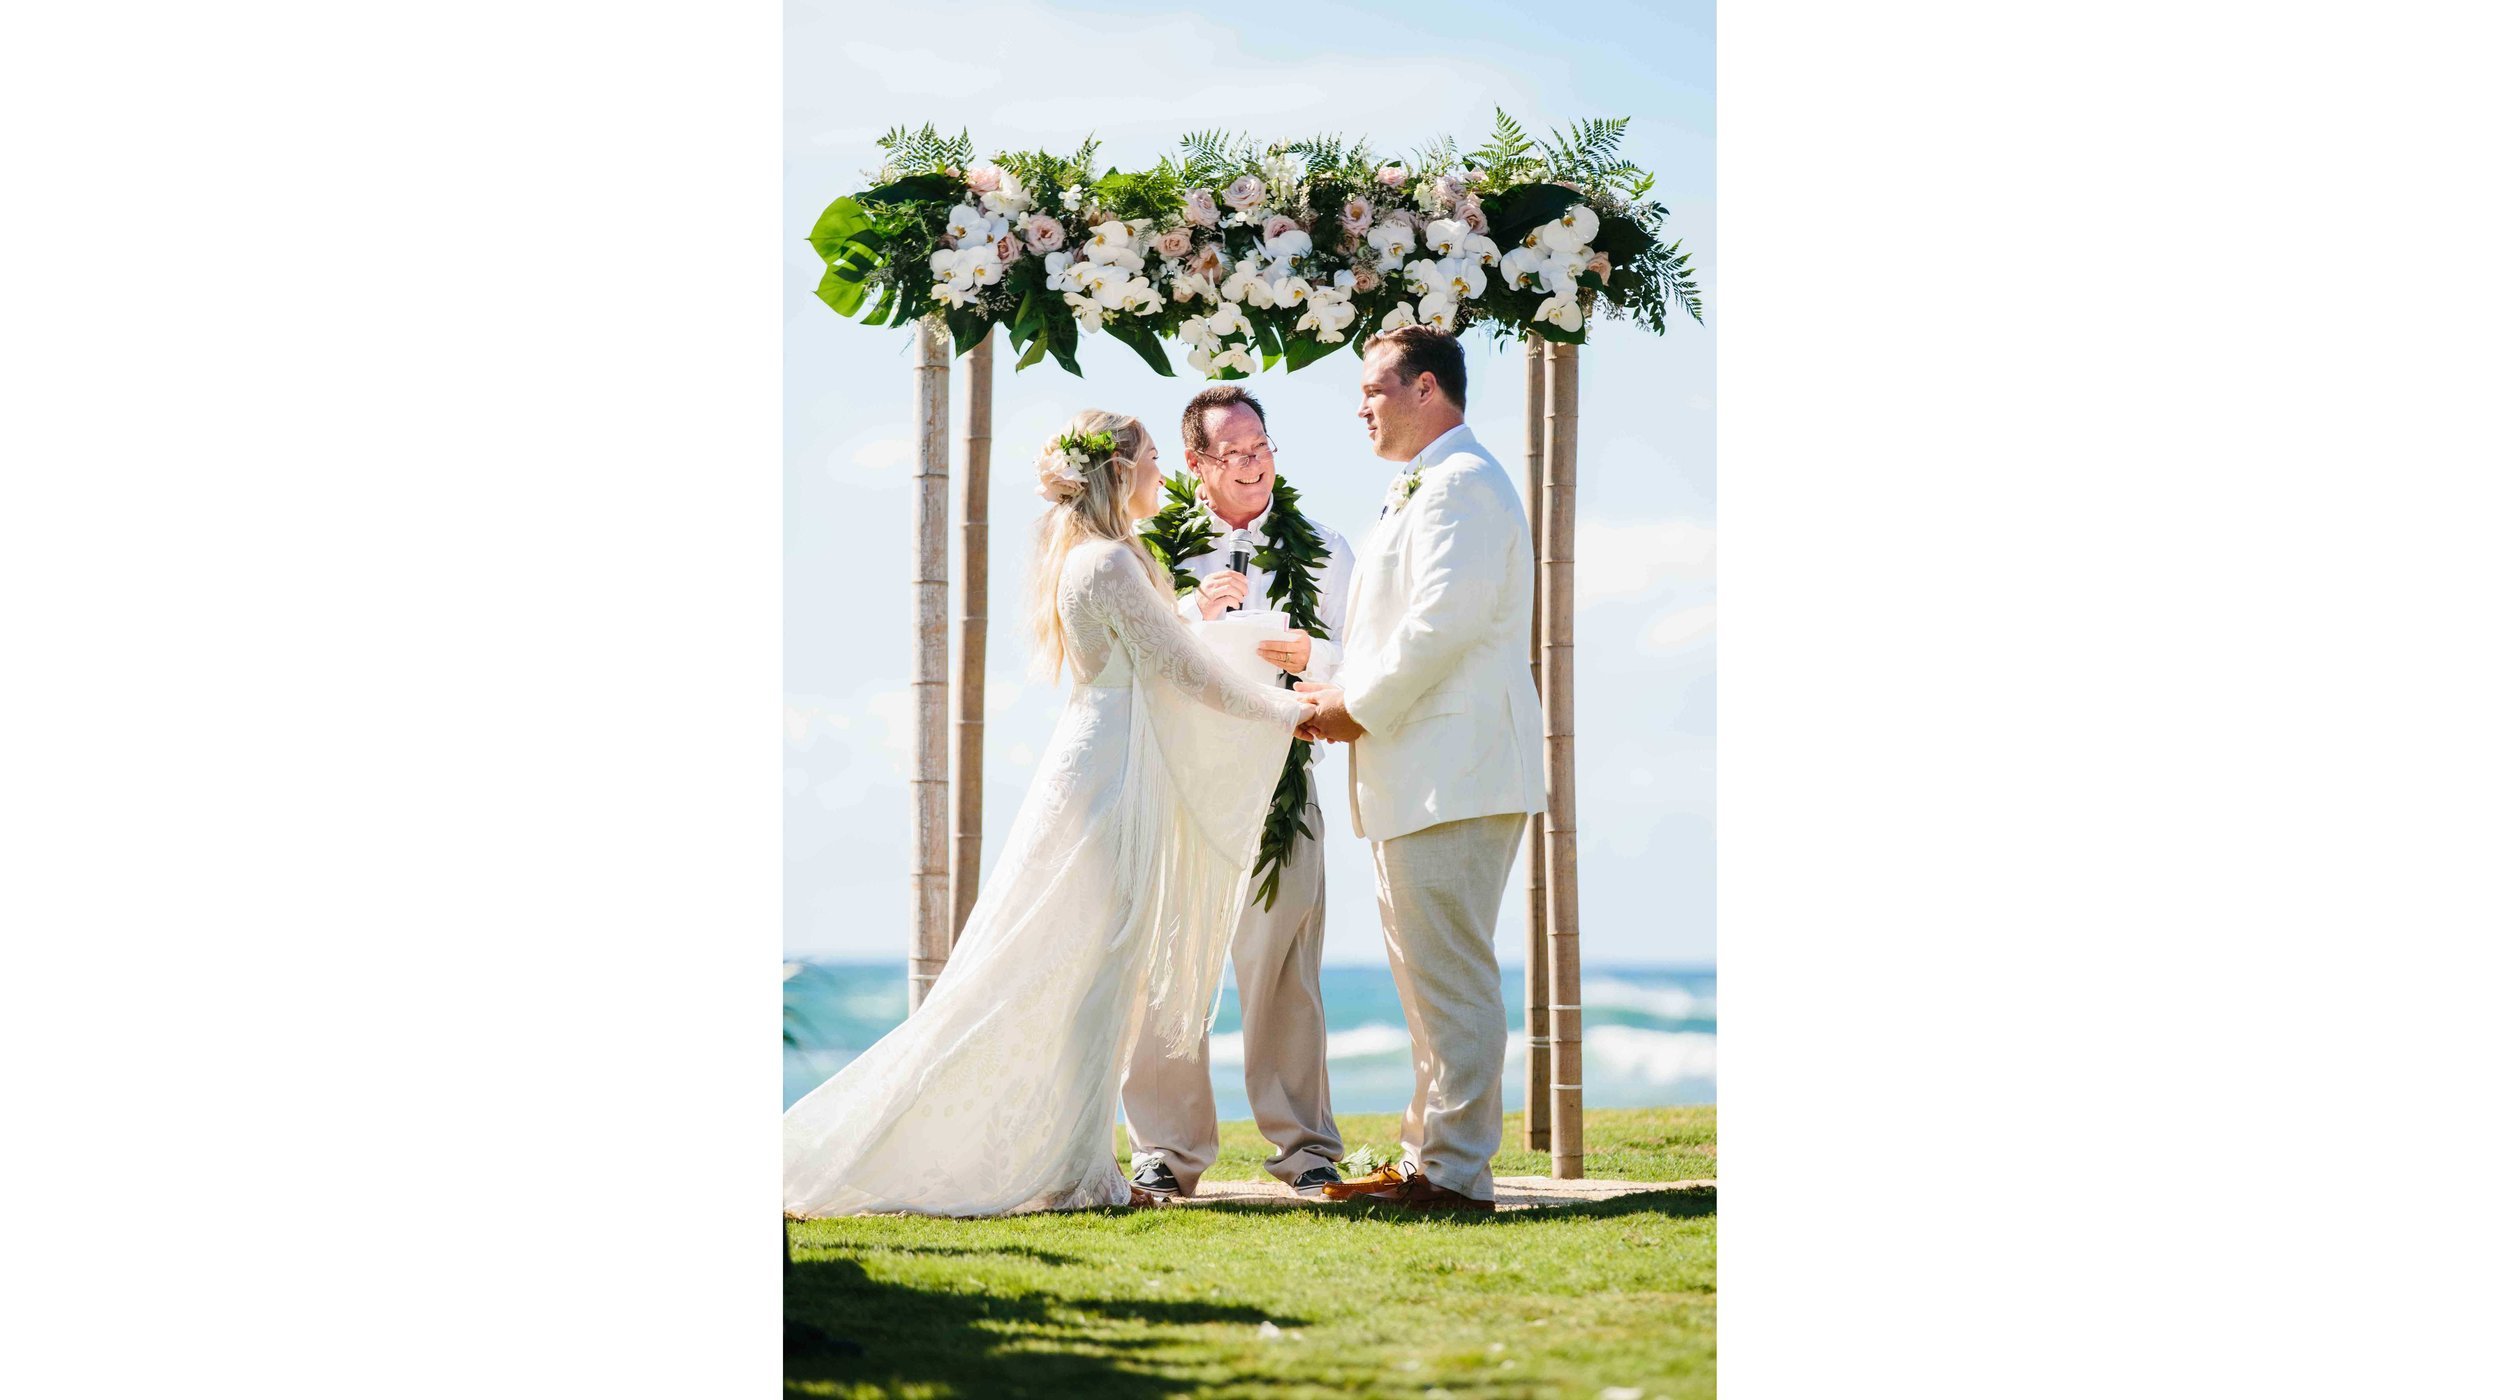 Hawaii Wedding Ceremony at Loulu Palm Estate